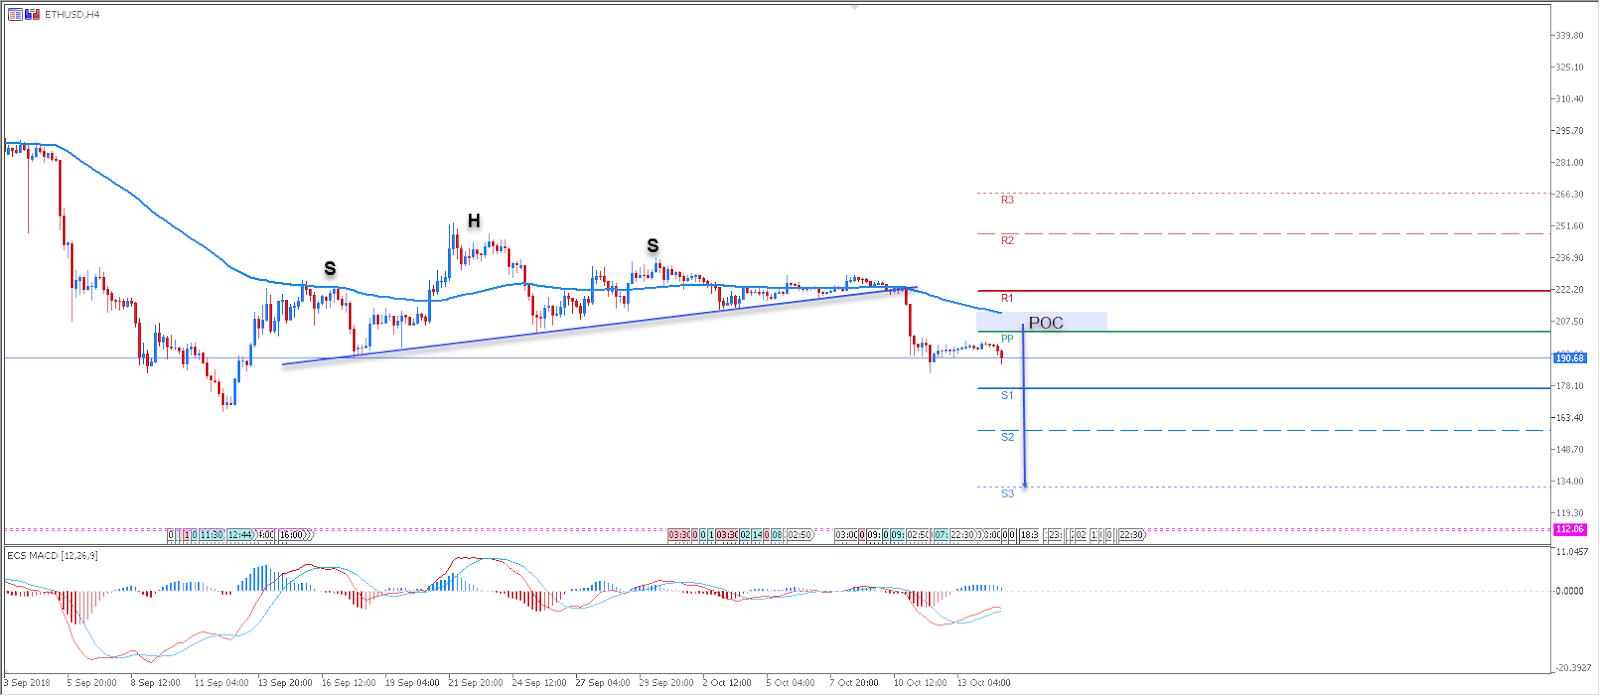 ETHUSD Daily Chart - Technical Analysis